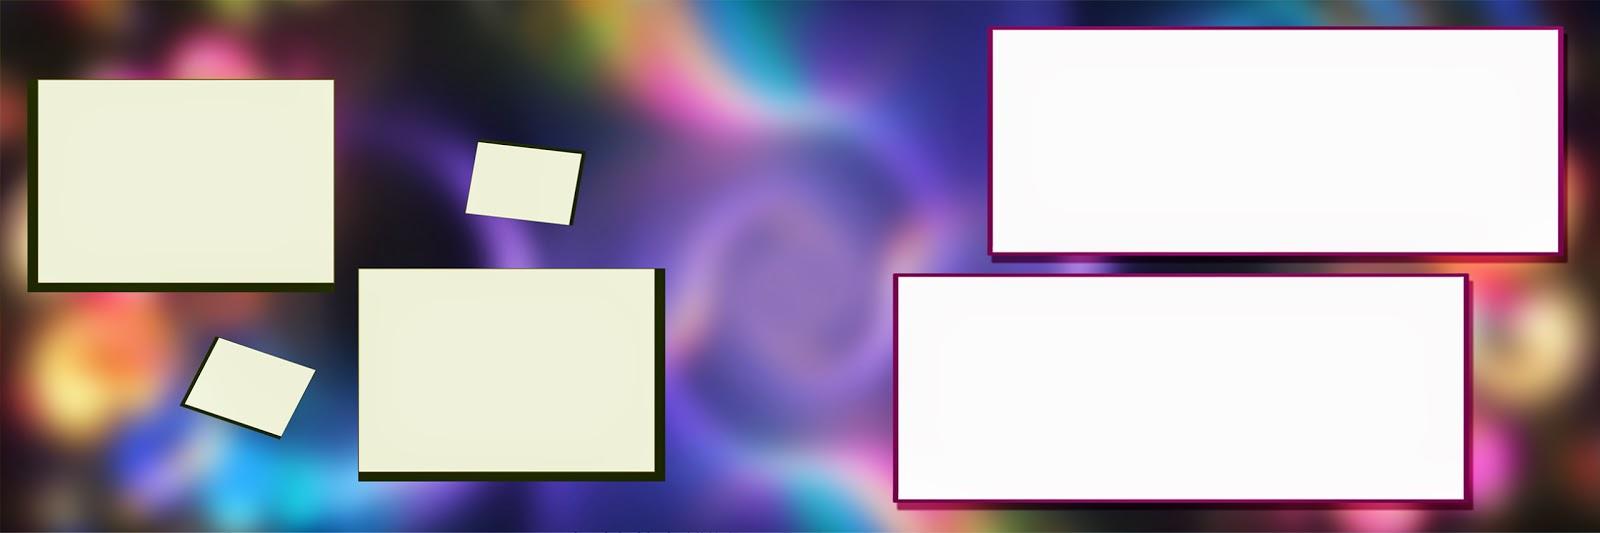 Creative Psd Files: 12x36 Latest Karizma Album Template 20 Psd Files ...